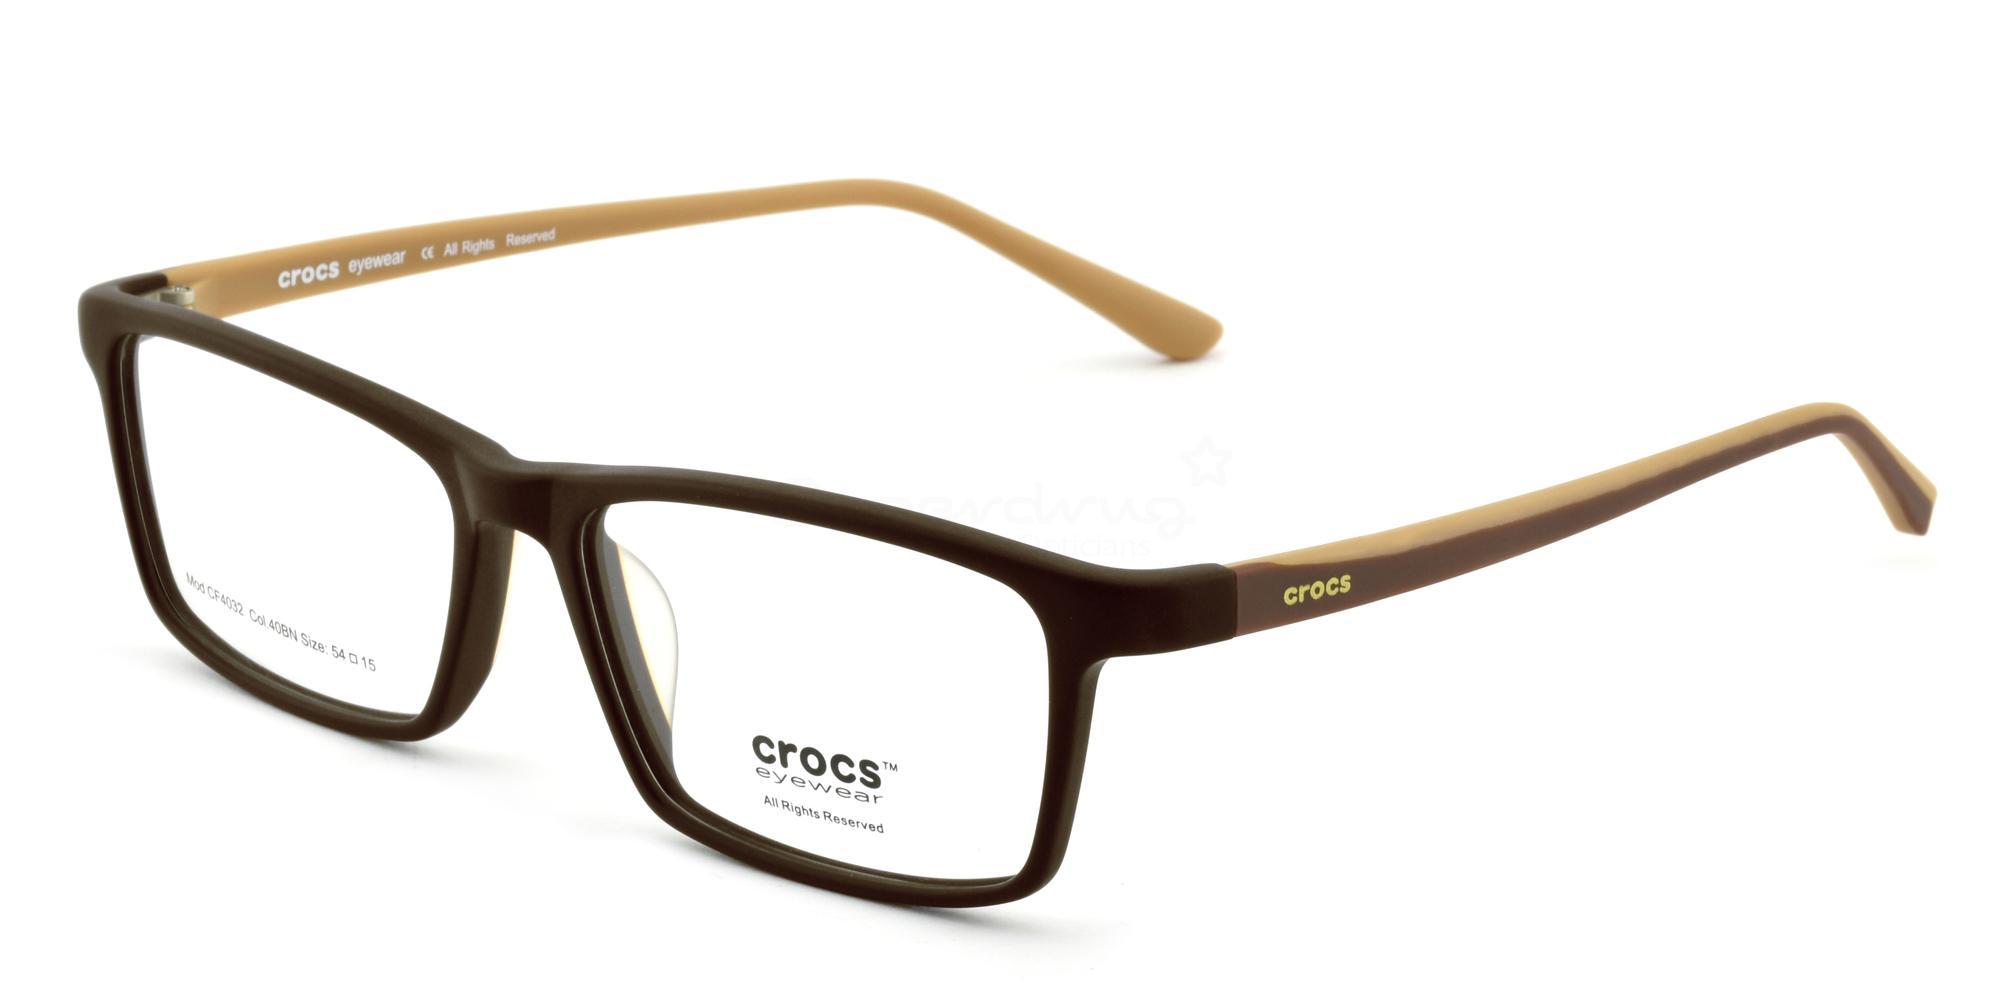 40BN CF4032 Glasses, Crocs Eyewear